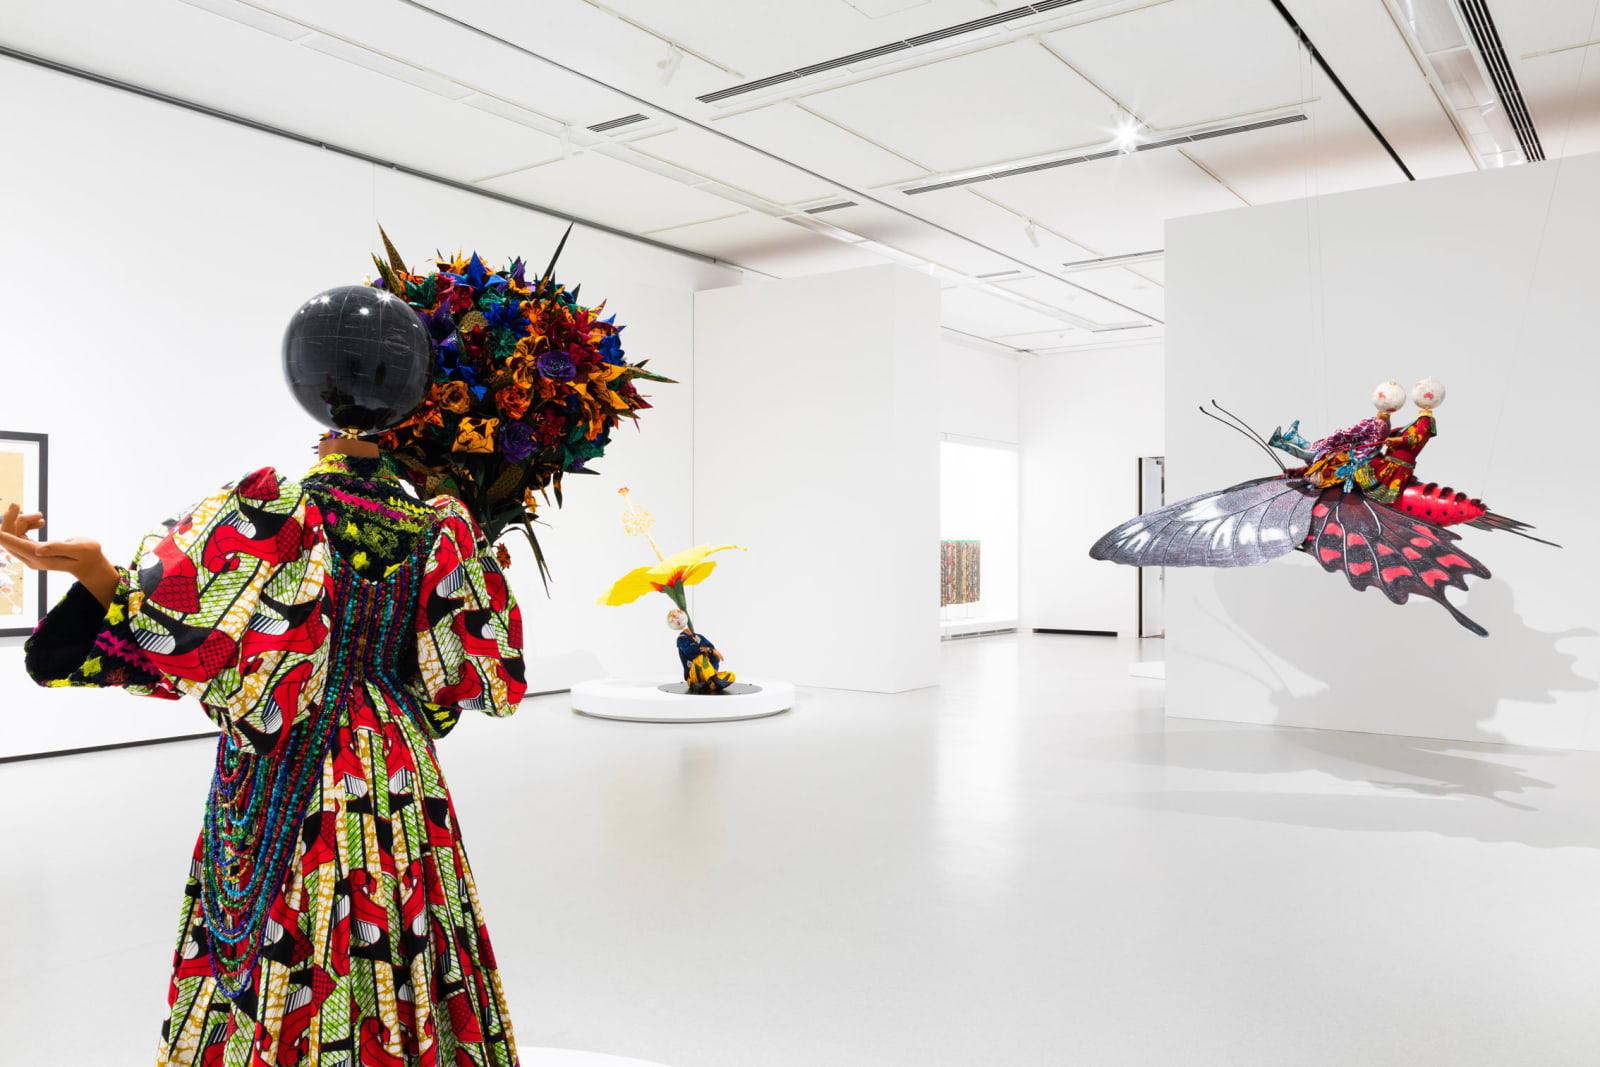 <p>Installation view: 'Yinka Shonibare MBE: Flower Power', Fukuoka Art Museum, Fukuoka (2019).</p>